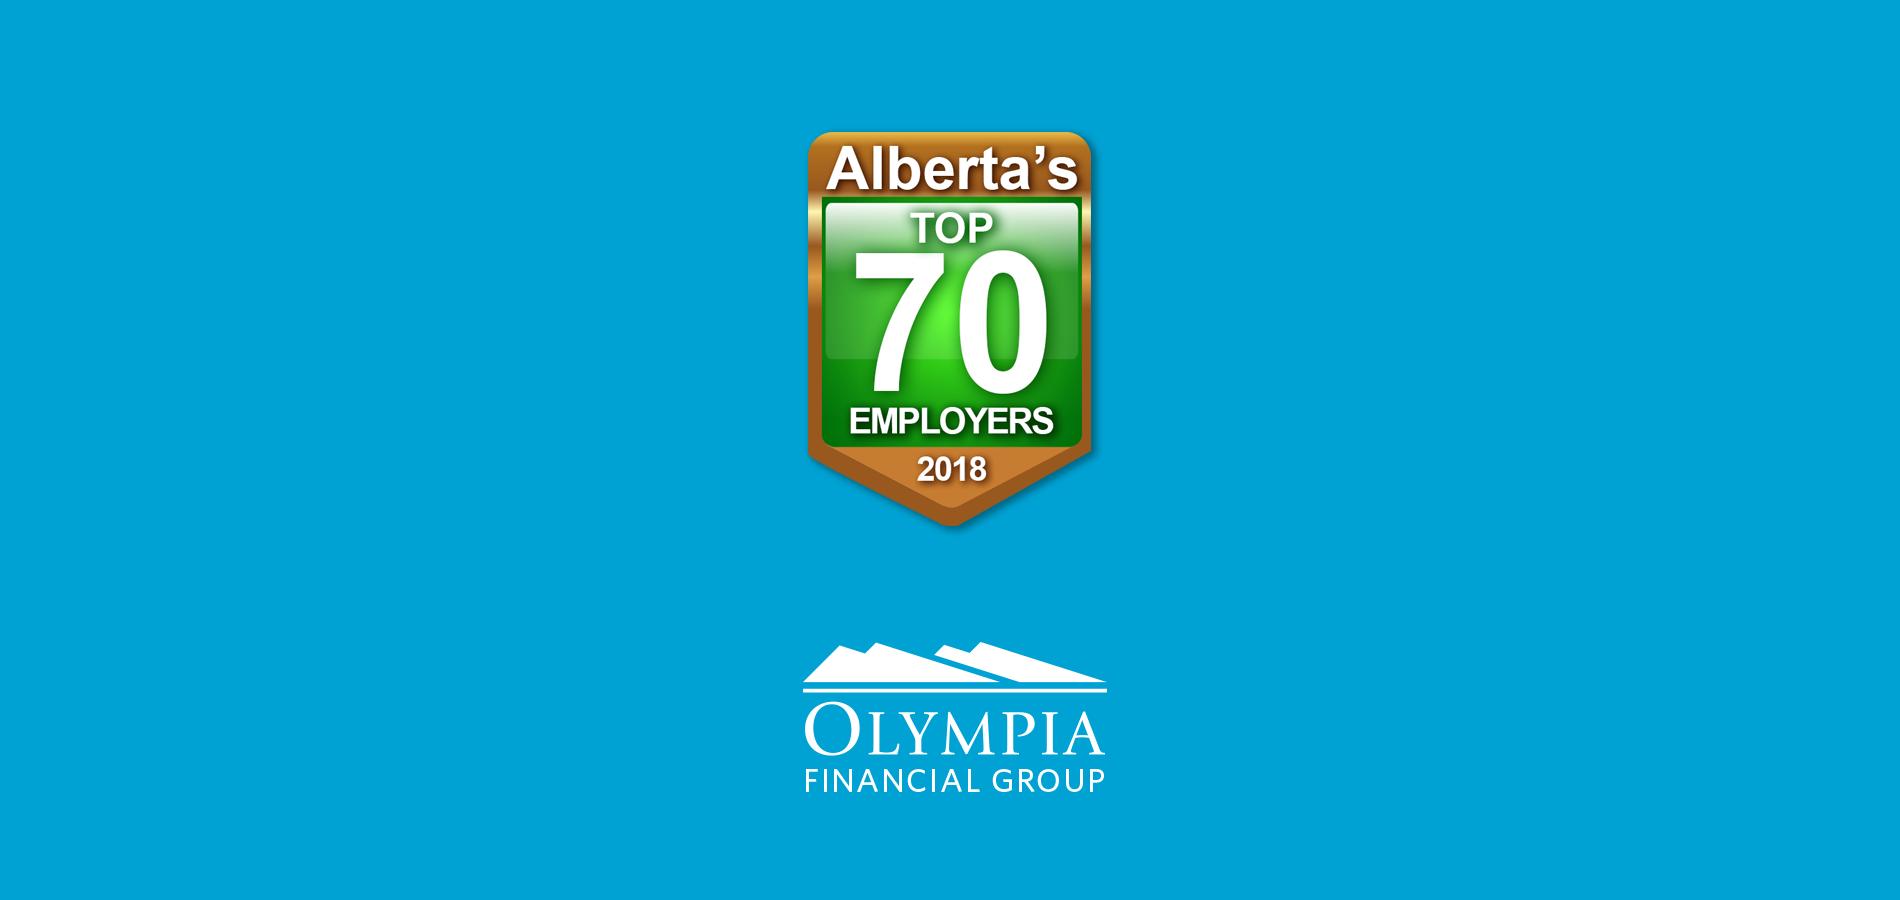 Alberta top 70 employers 2018